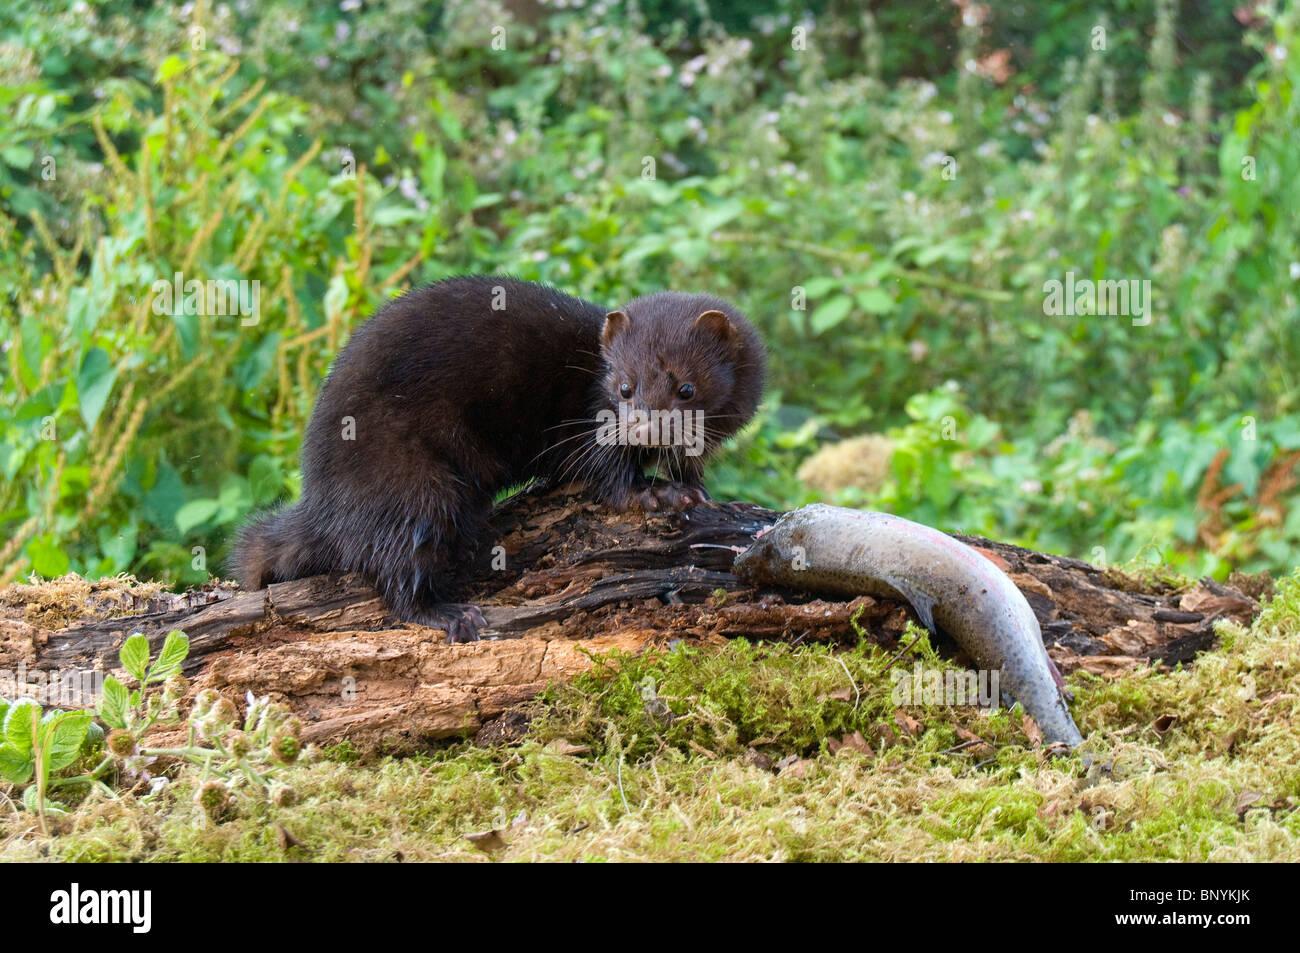 American mink(Mustela vison). - Stock Image